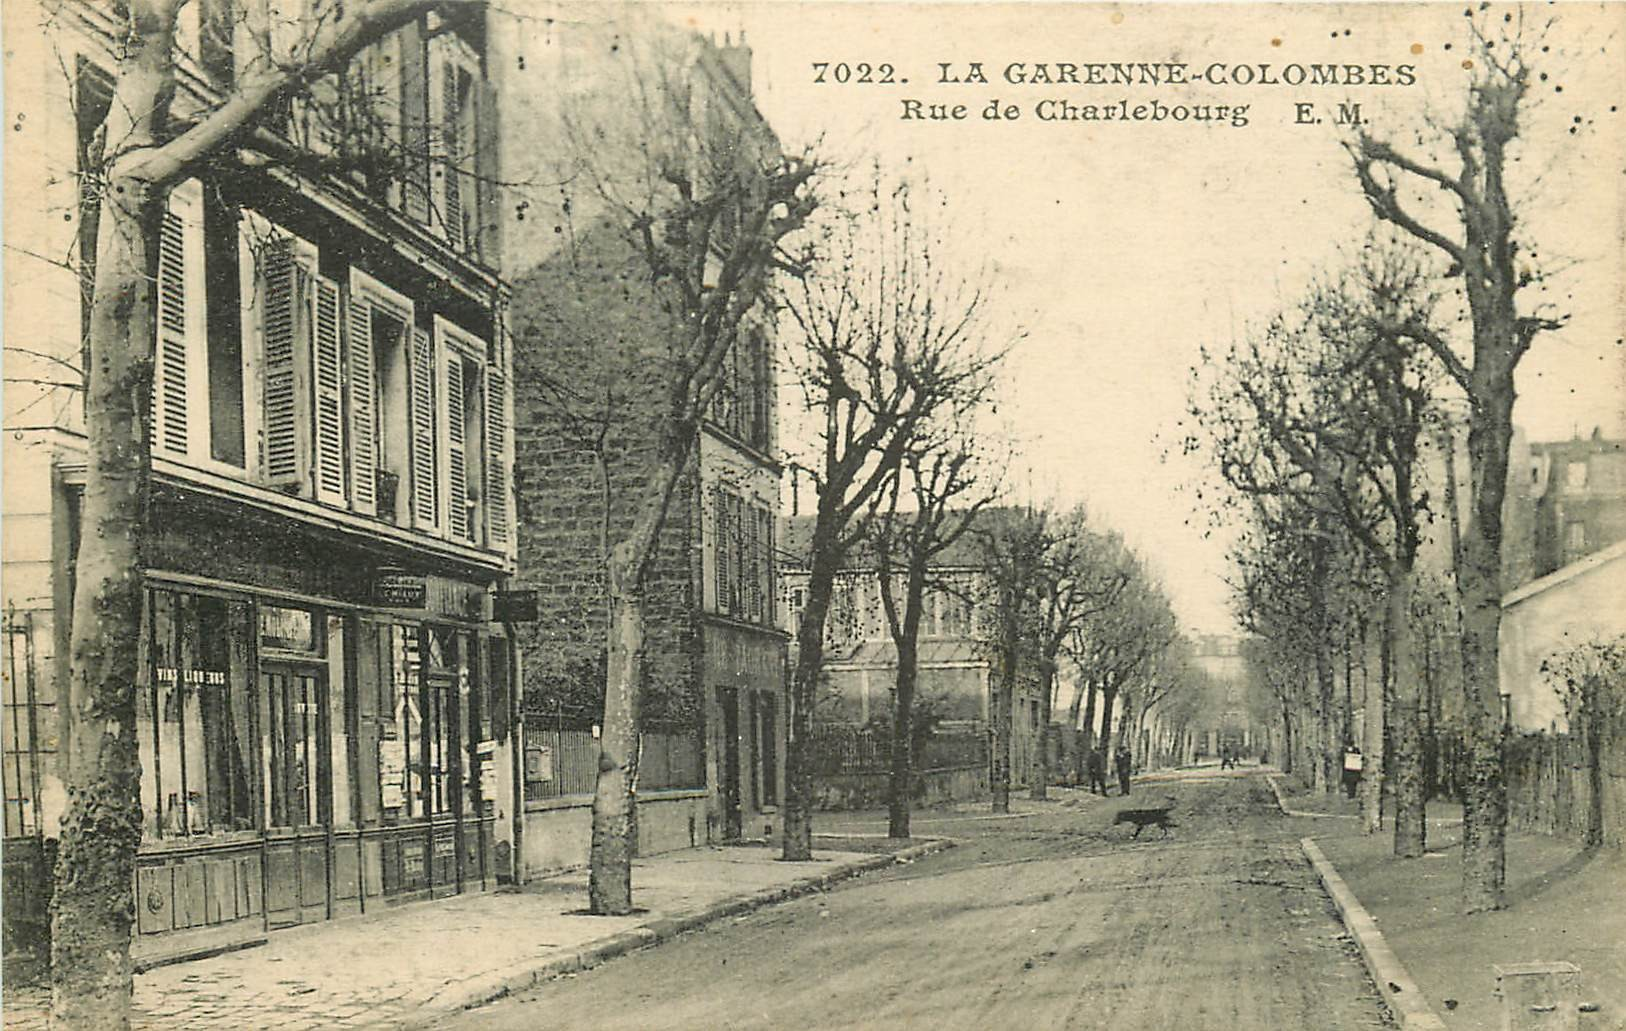 WW 92 LA GARENNE COLOMBES. Buvette rue de Charlebourg 1923